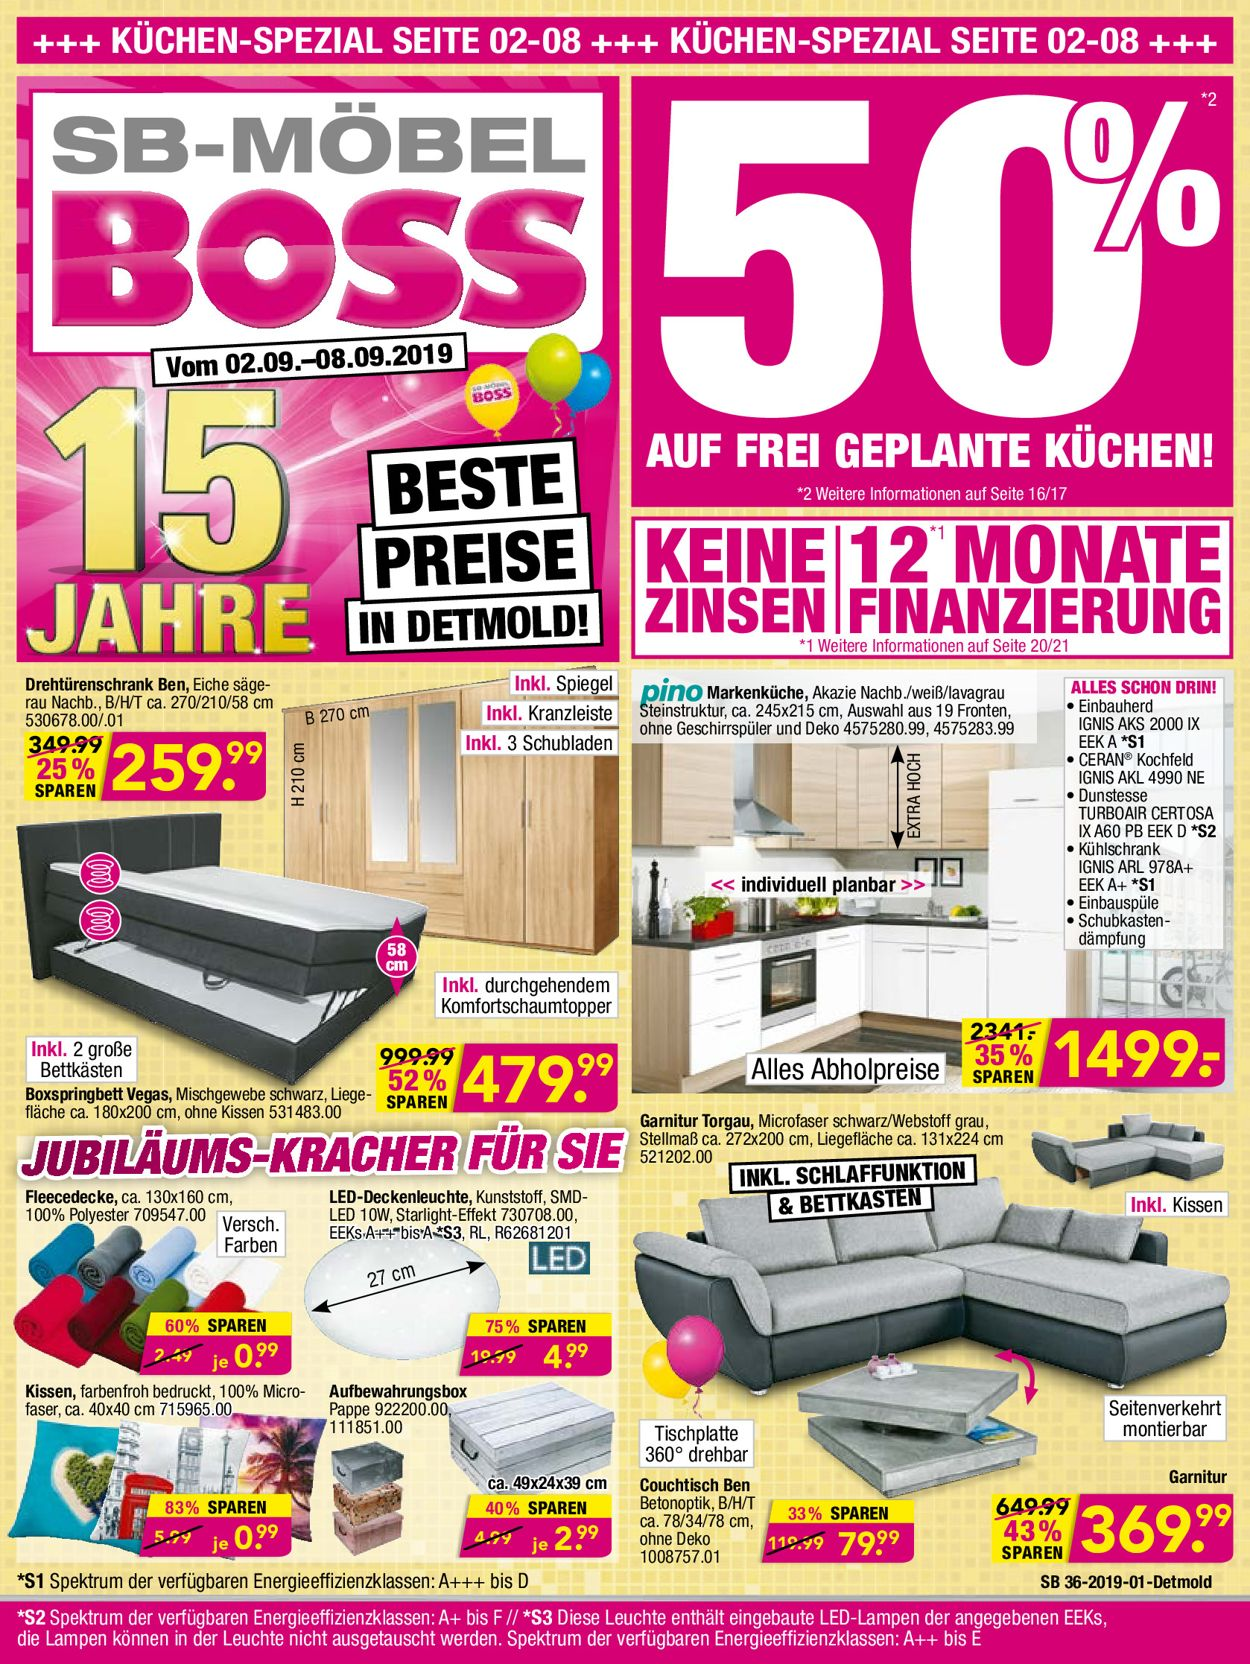 SB Möbel Boss Aktueller Prospekt 18.18 - 18.18.18 - jedewoche